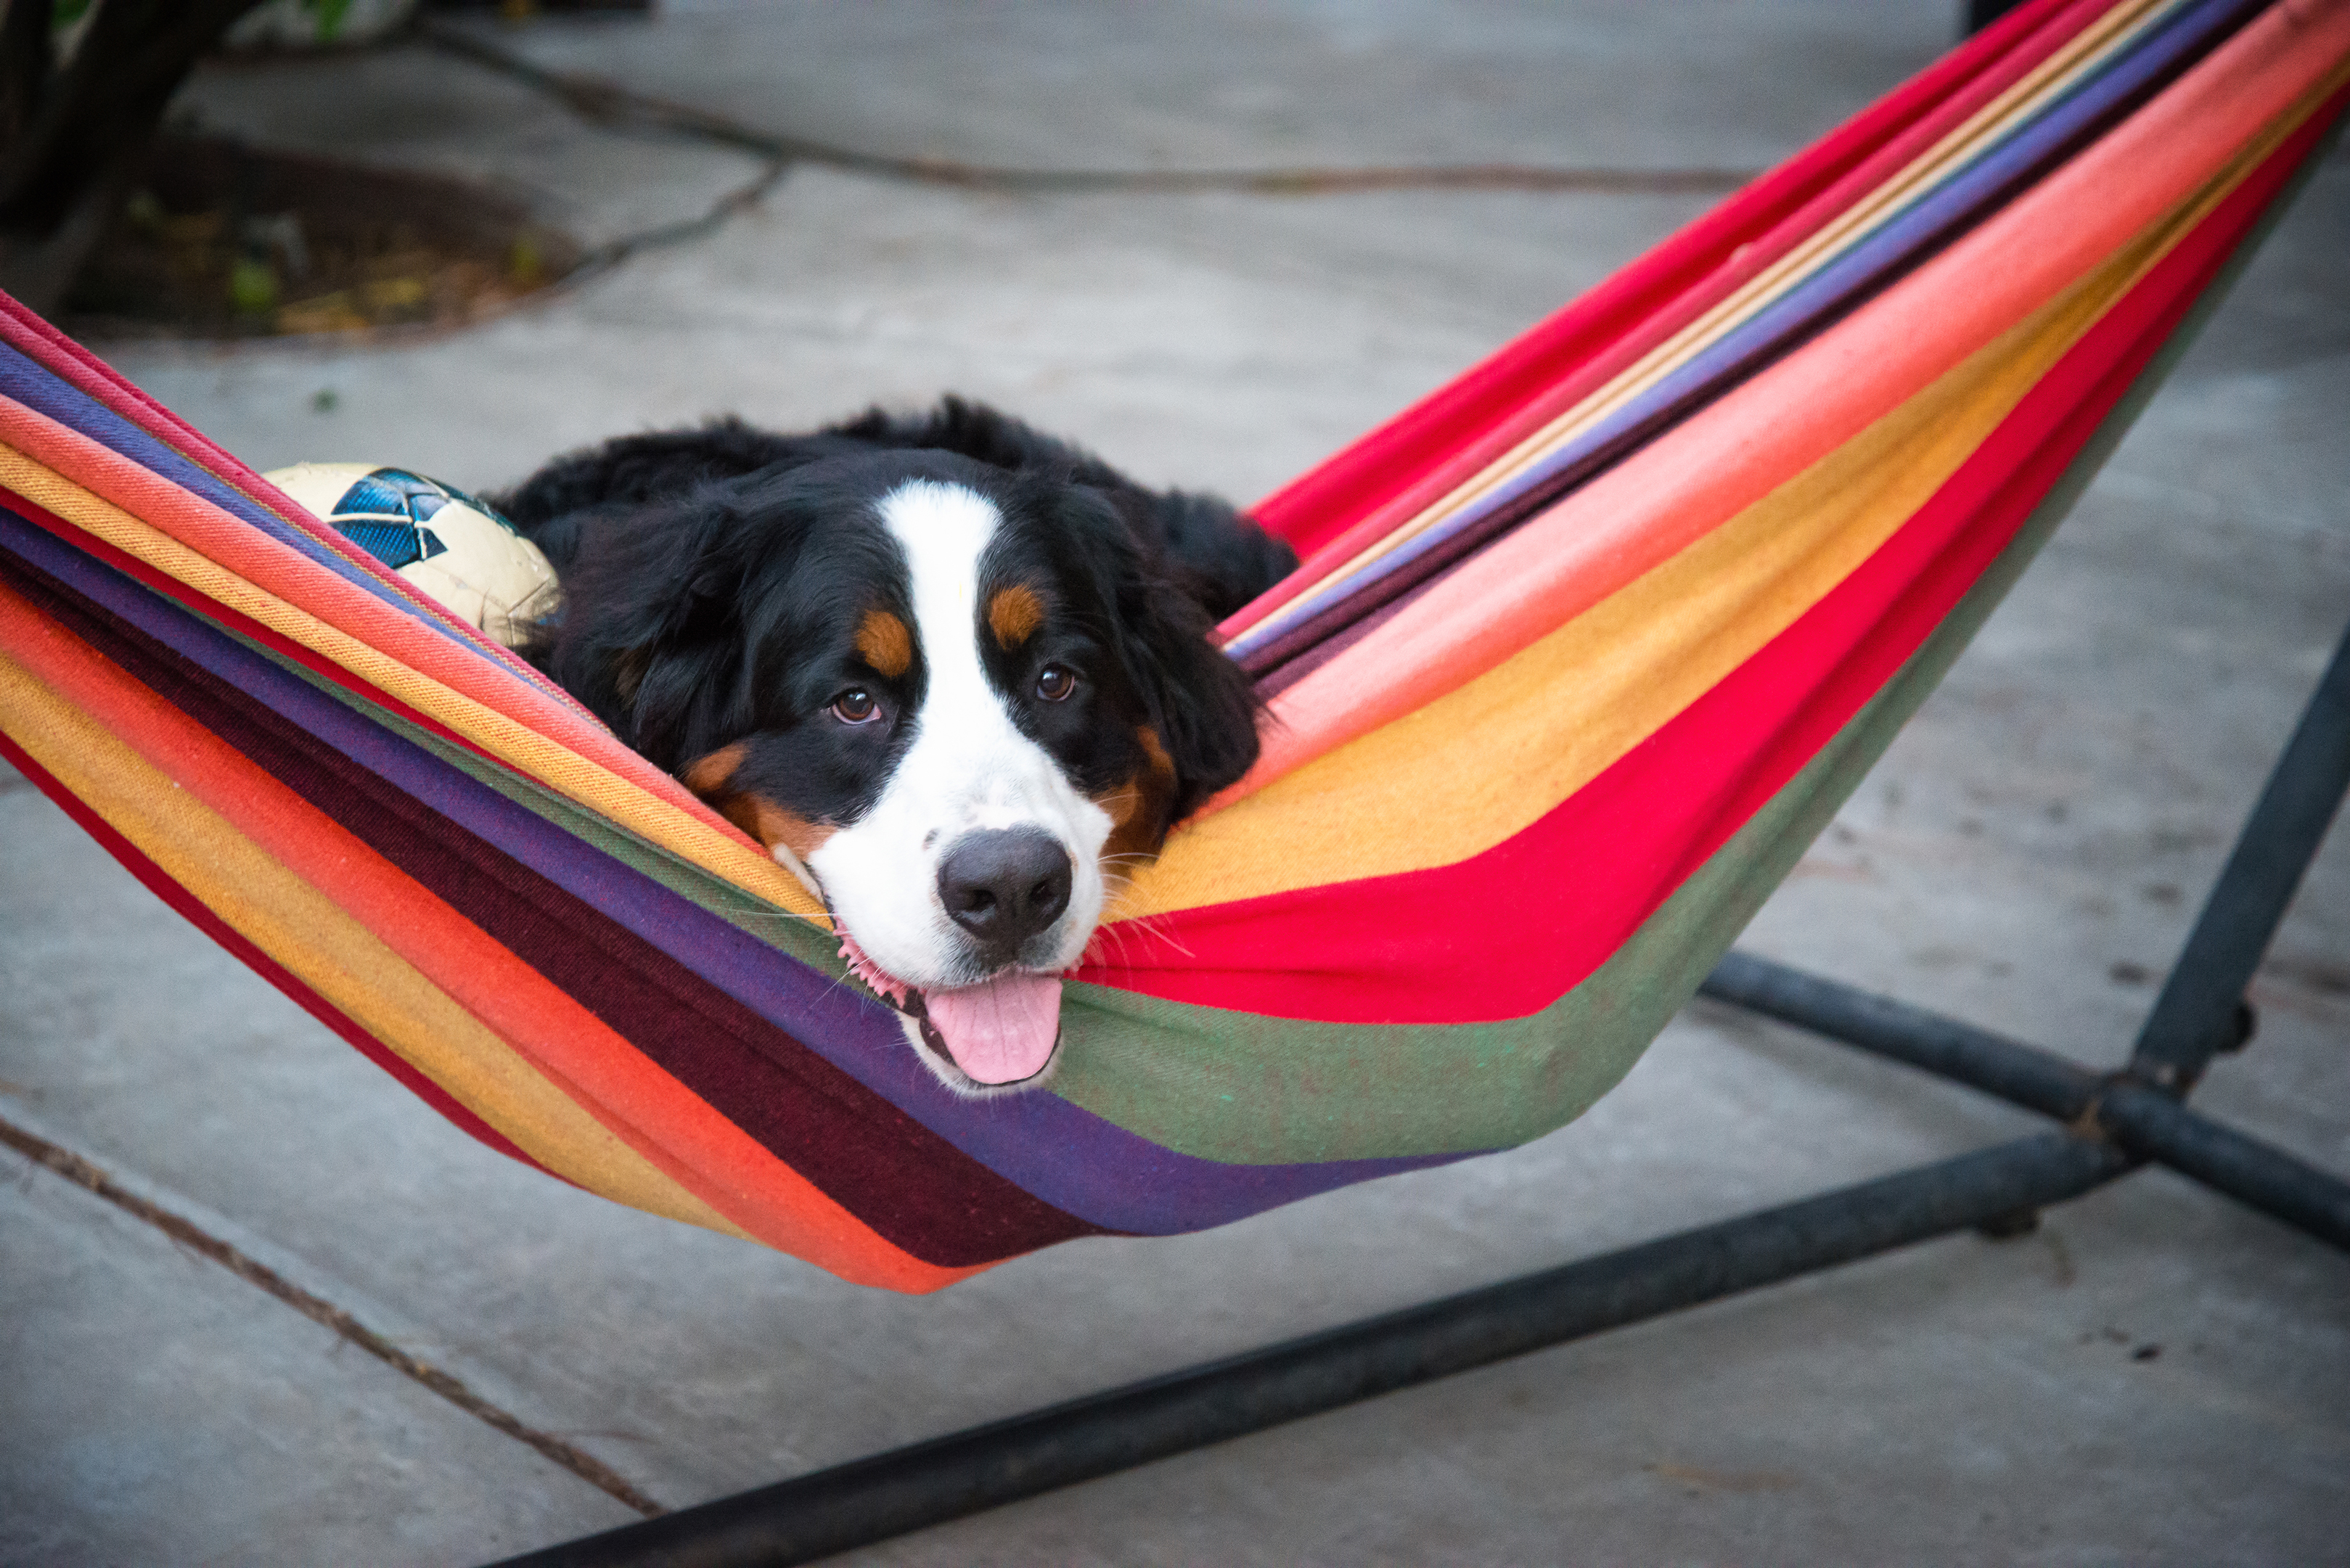 Doggy in a Hammock